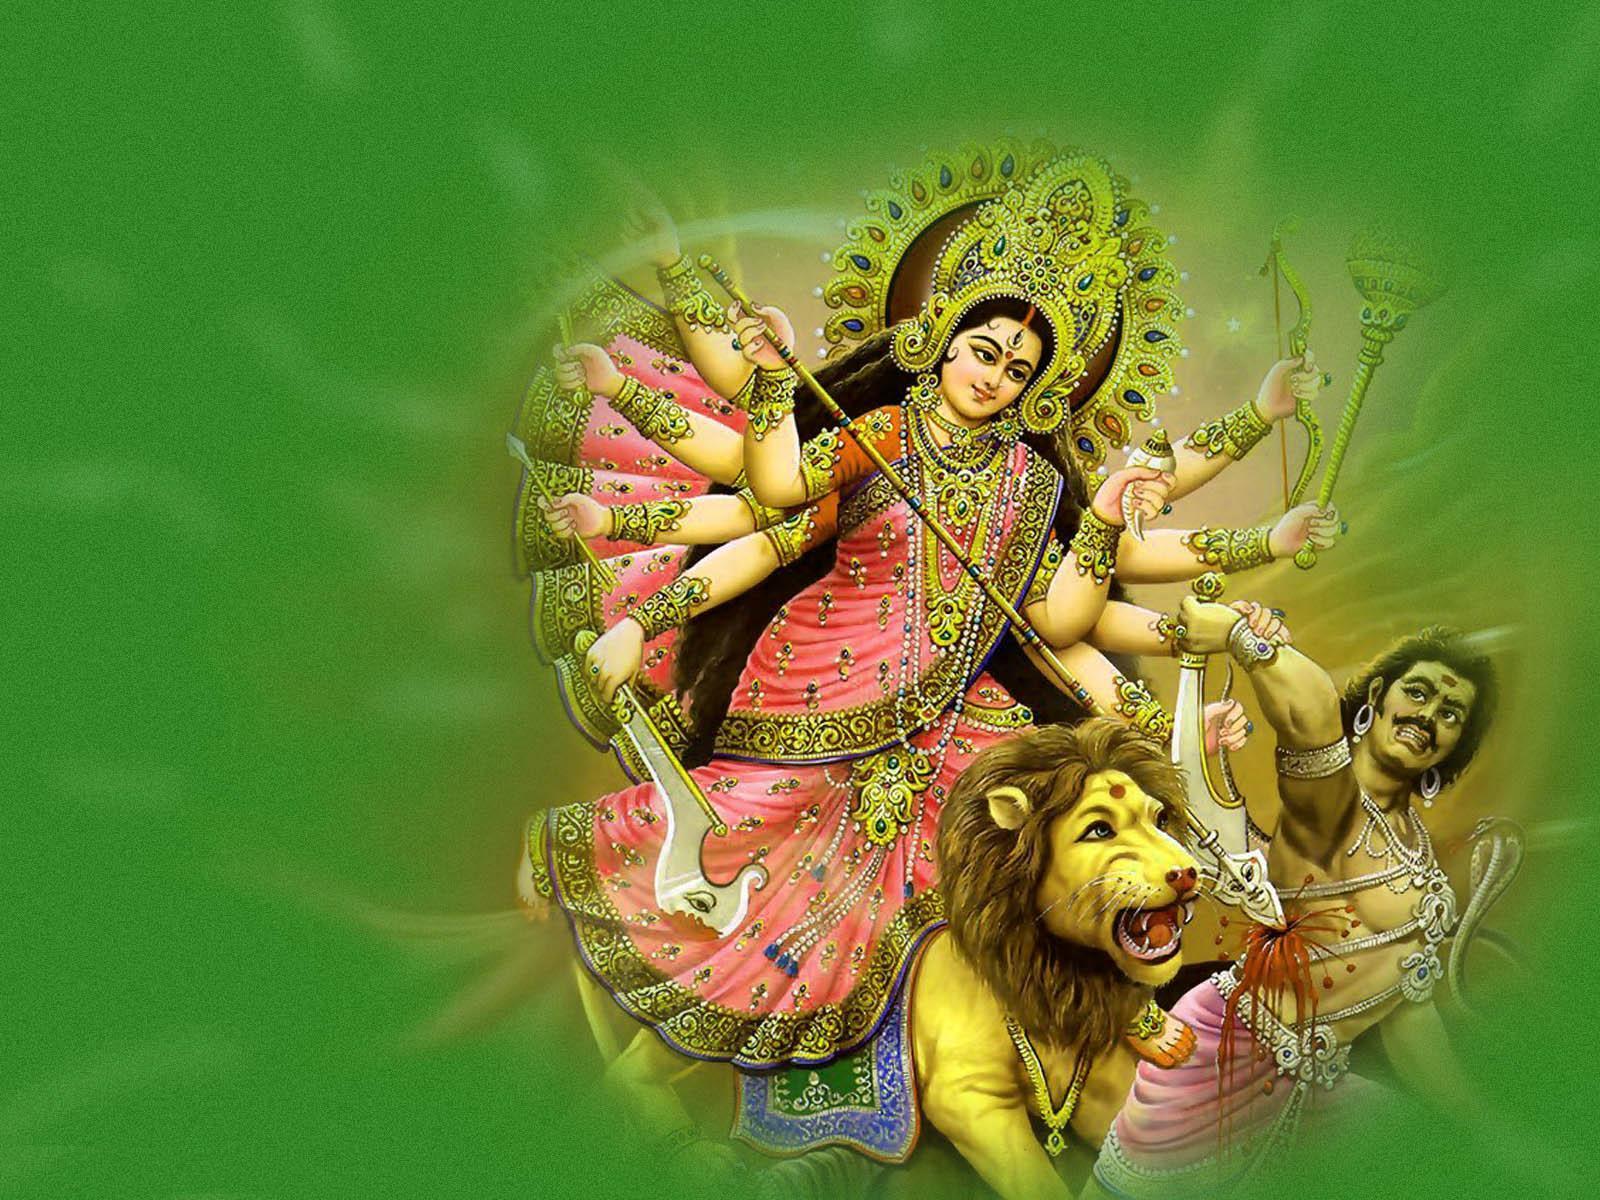 http://2.bp.blogspot.com/-Rd0IMsFIflY/TmO3kmDGUoI/AAAAAAAADn8/IajYI2E5JJE/s1600/durga-Devi_posters.jpg